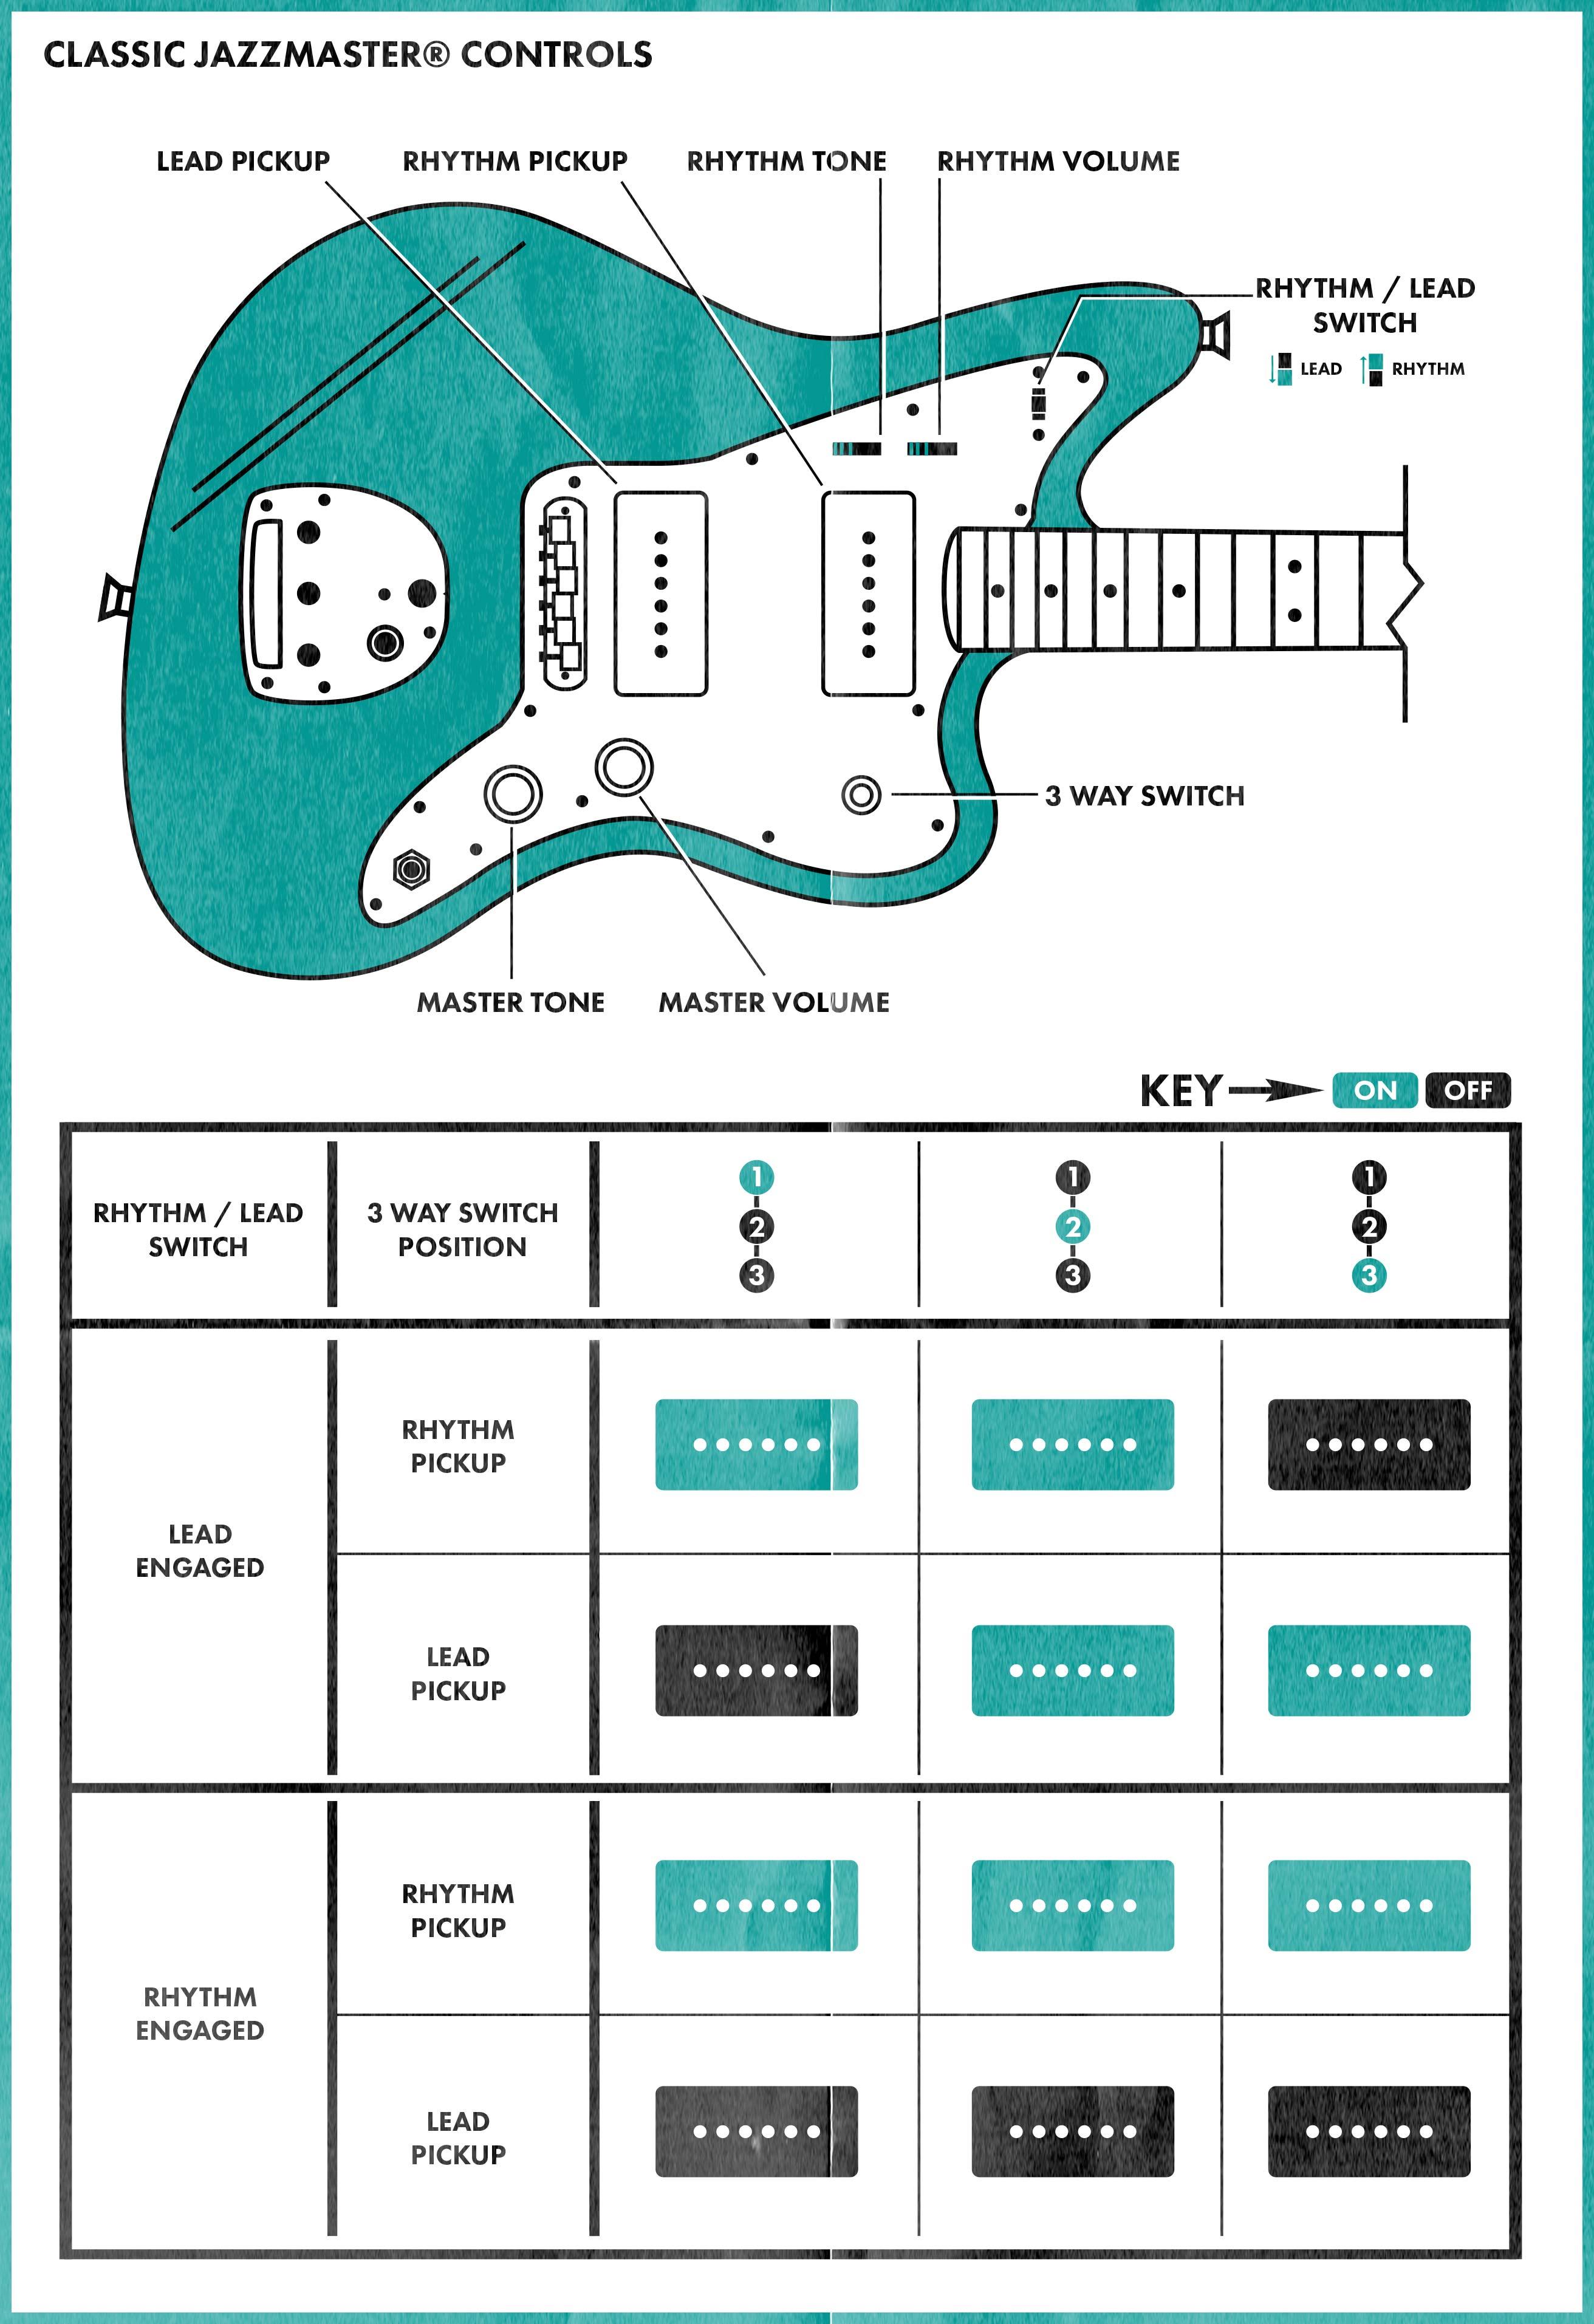 16349 jazzmaster diagram2?resize\\\\=665%2C970\\\\&ssl\\\\=1 100 [ fender mustang wiring diagram ] jb jr pickup into mustang  at alyssarenee.co